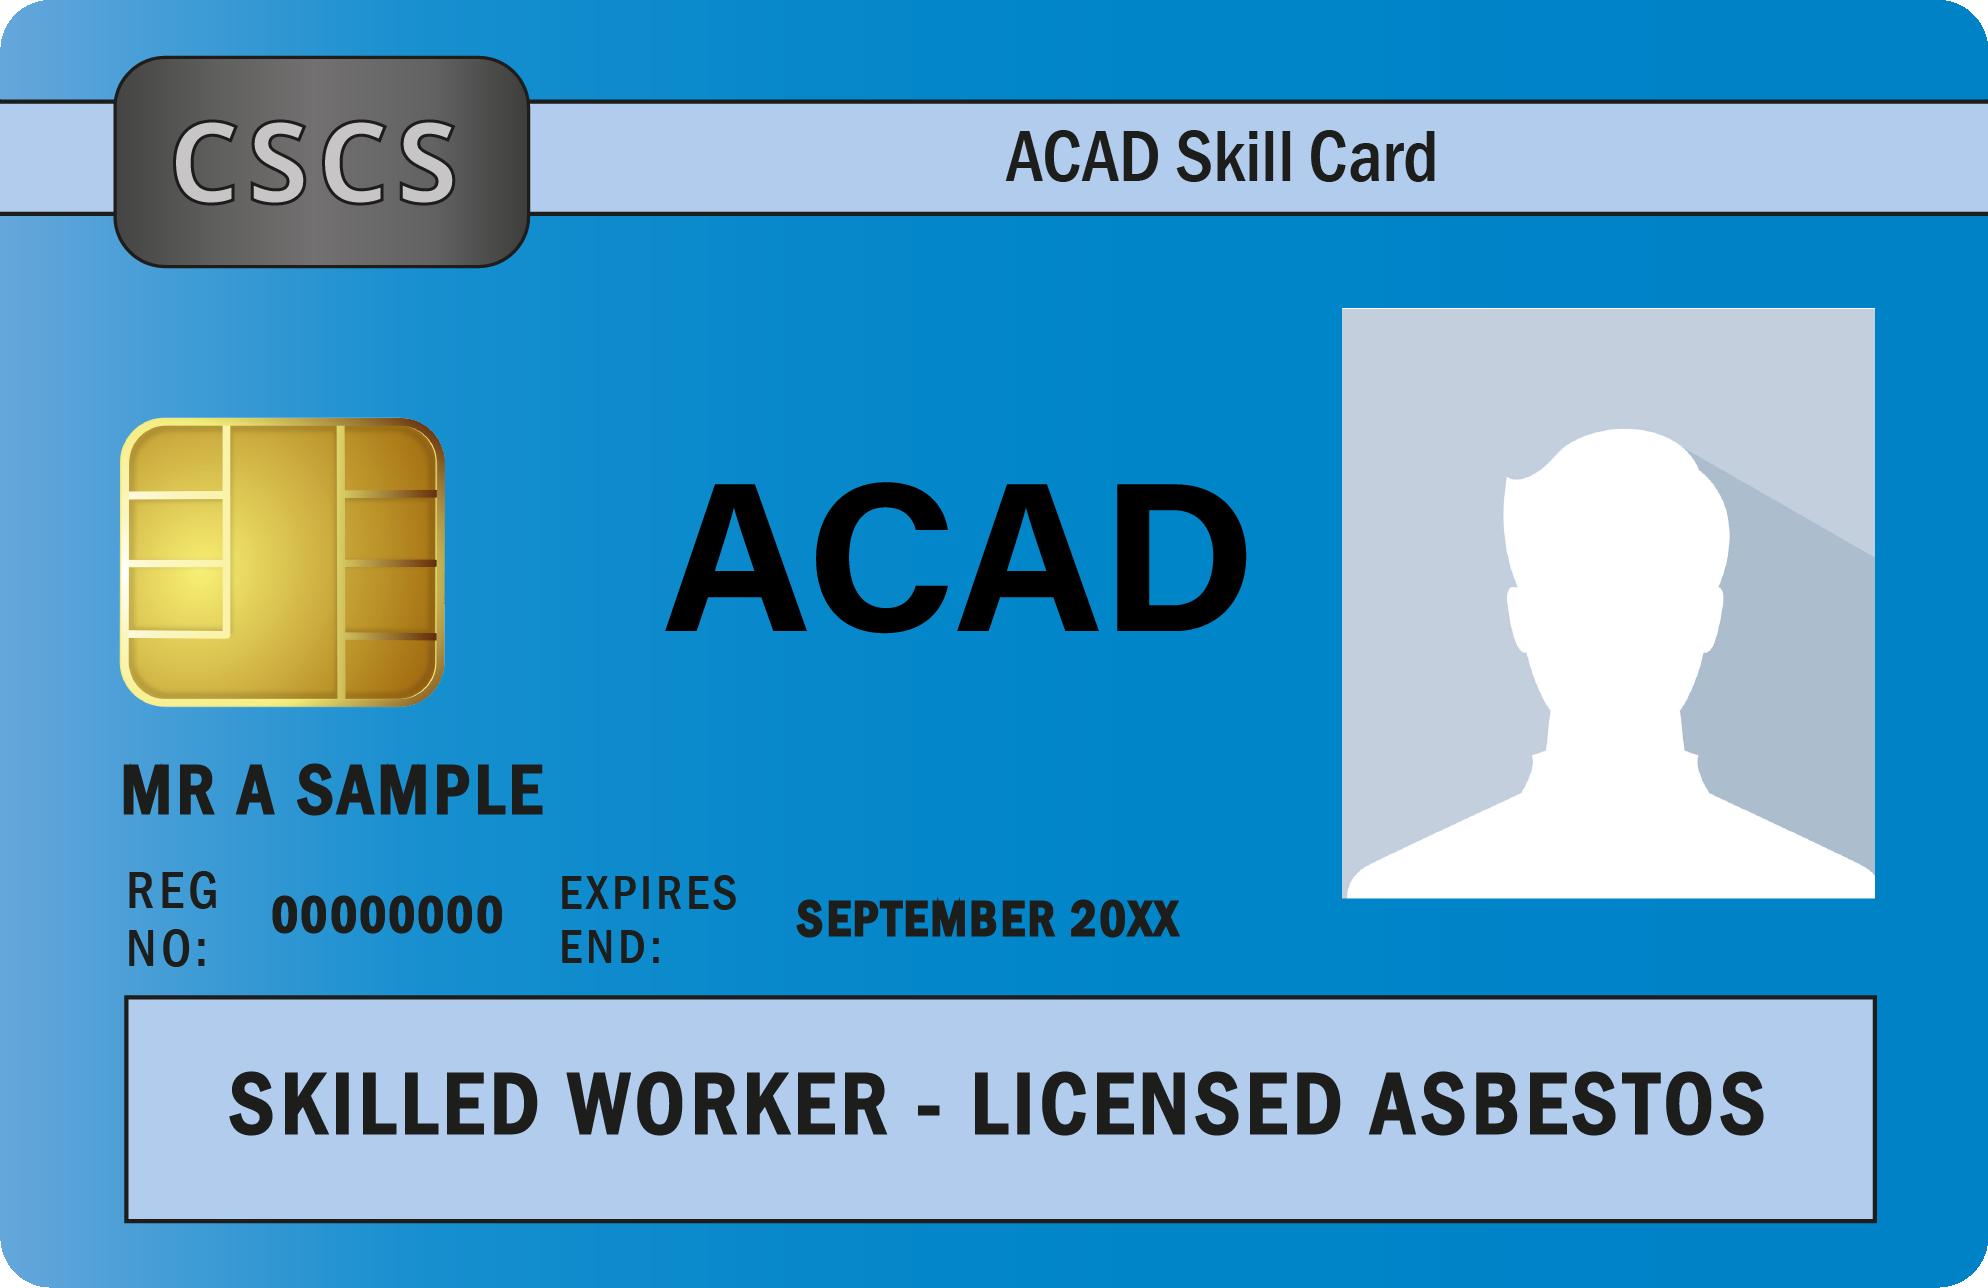 ACAD Card